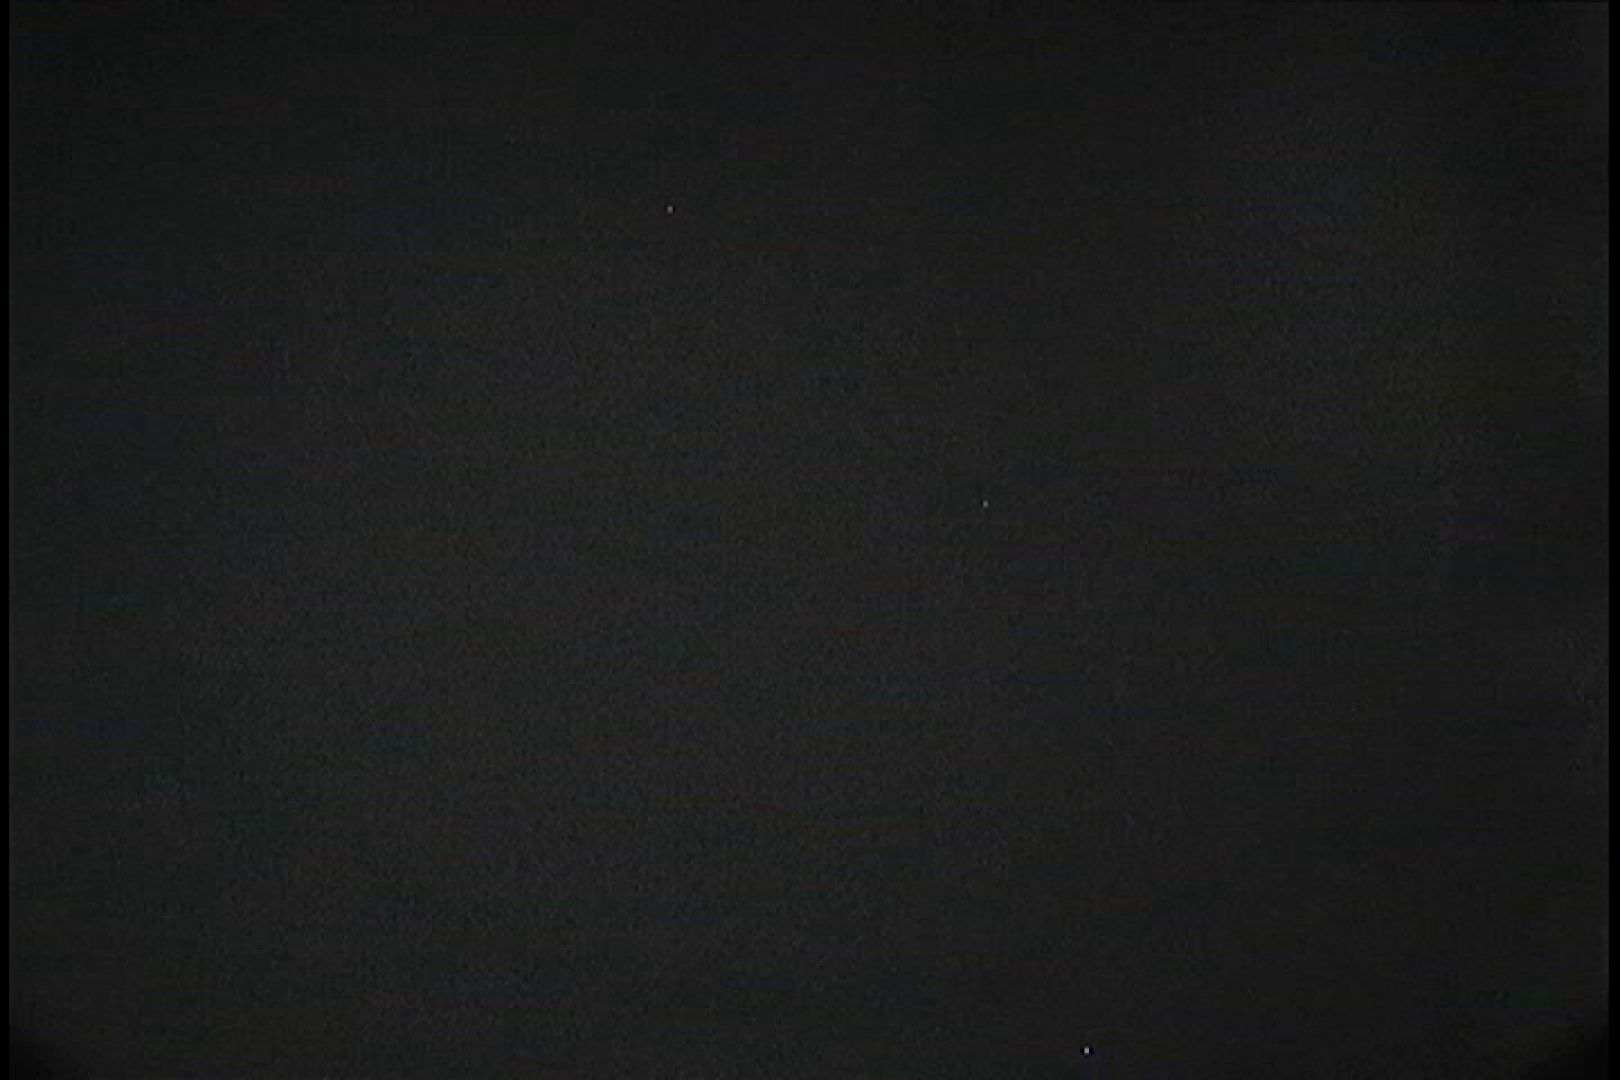 No.53 金髪ギャルの乳首に向かってズームイン 美乳 ワレメ無修正動画無料 109枚 74